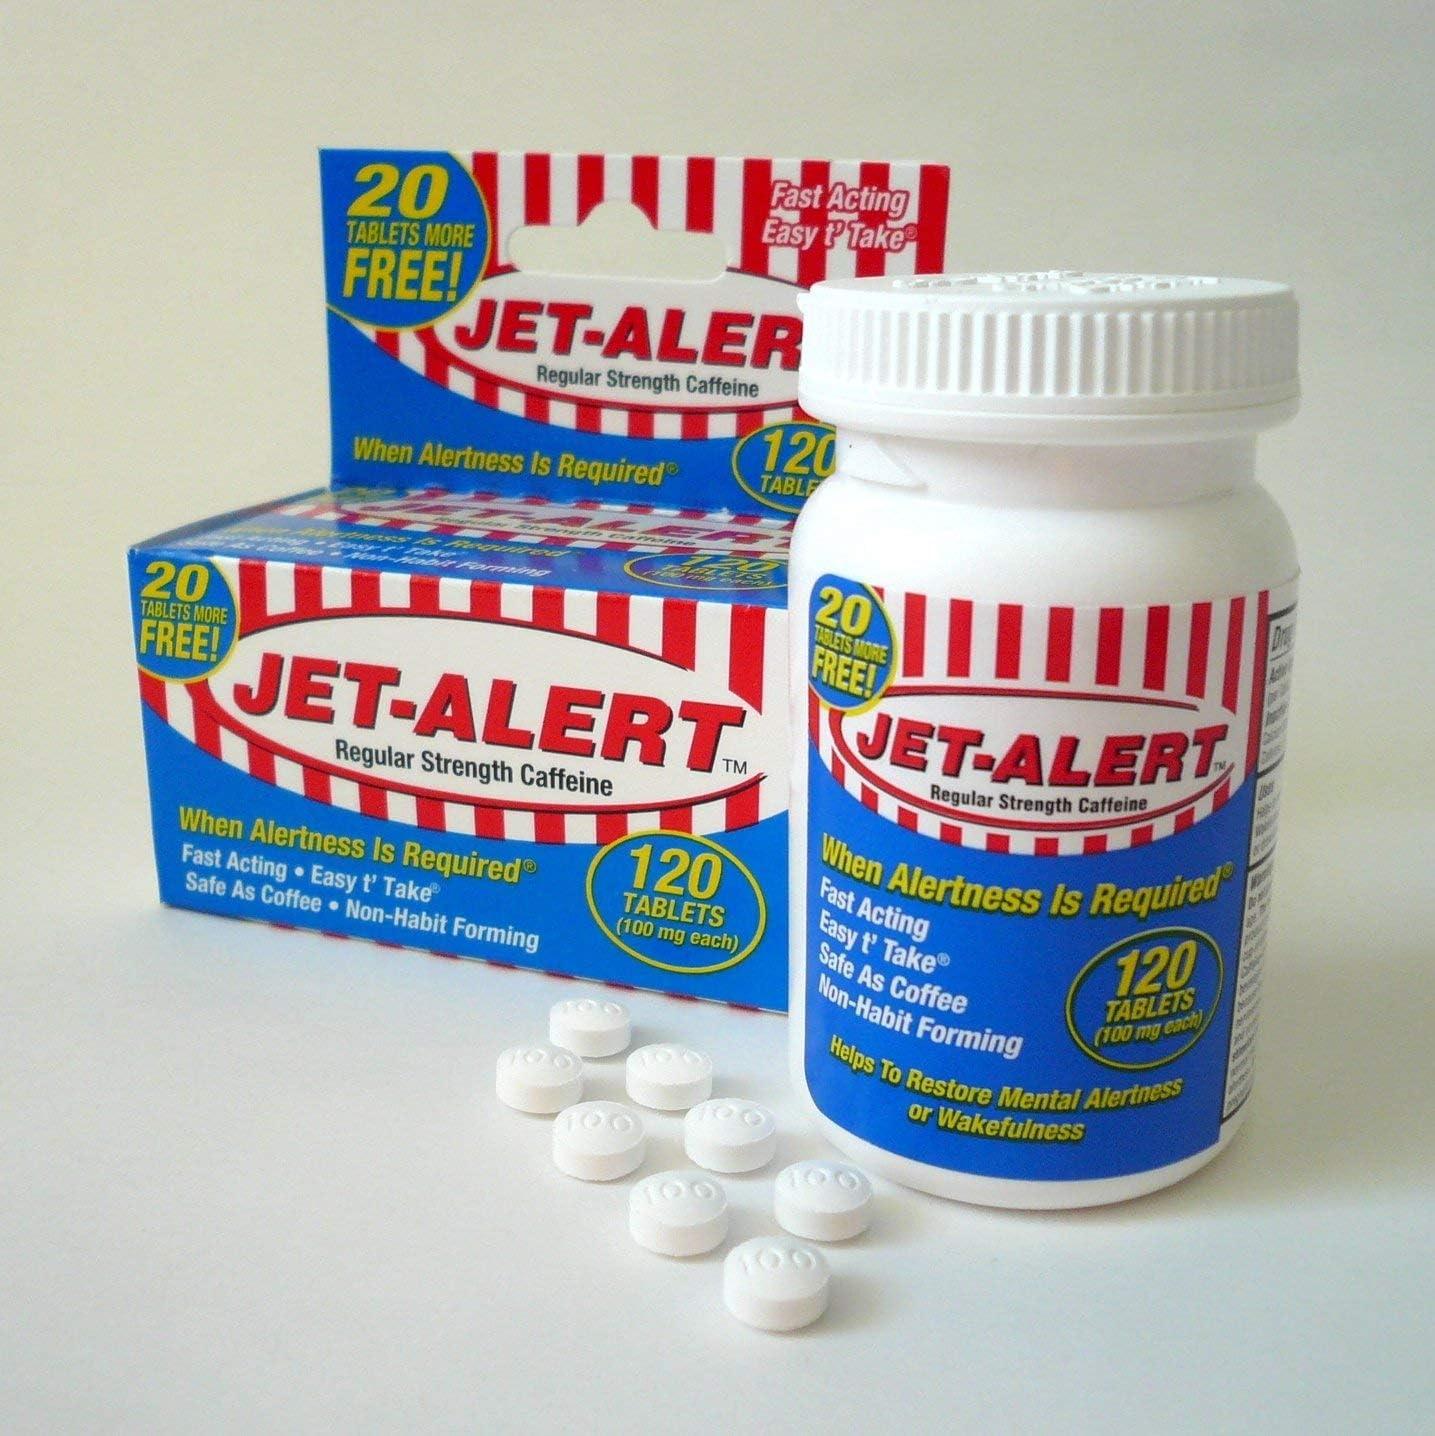 Jet-alert 100 Mg Each Caffeine Tab 120 Count Value Packs 2